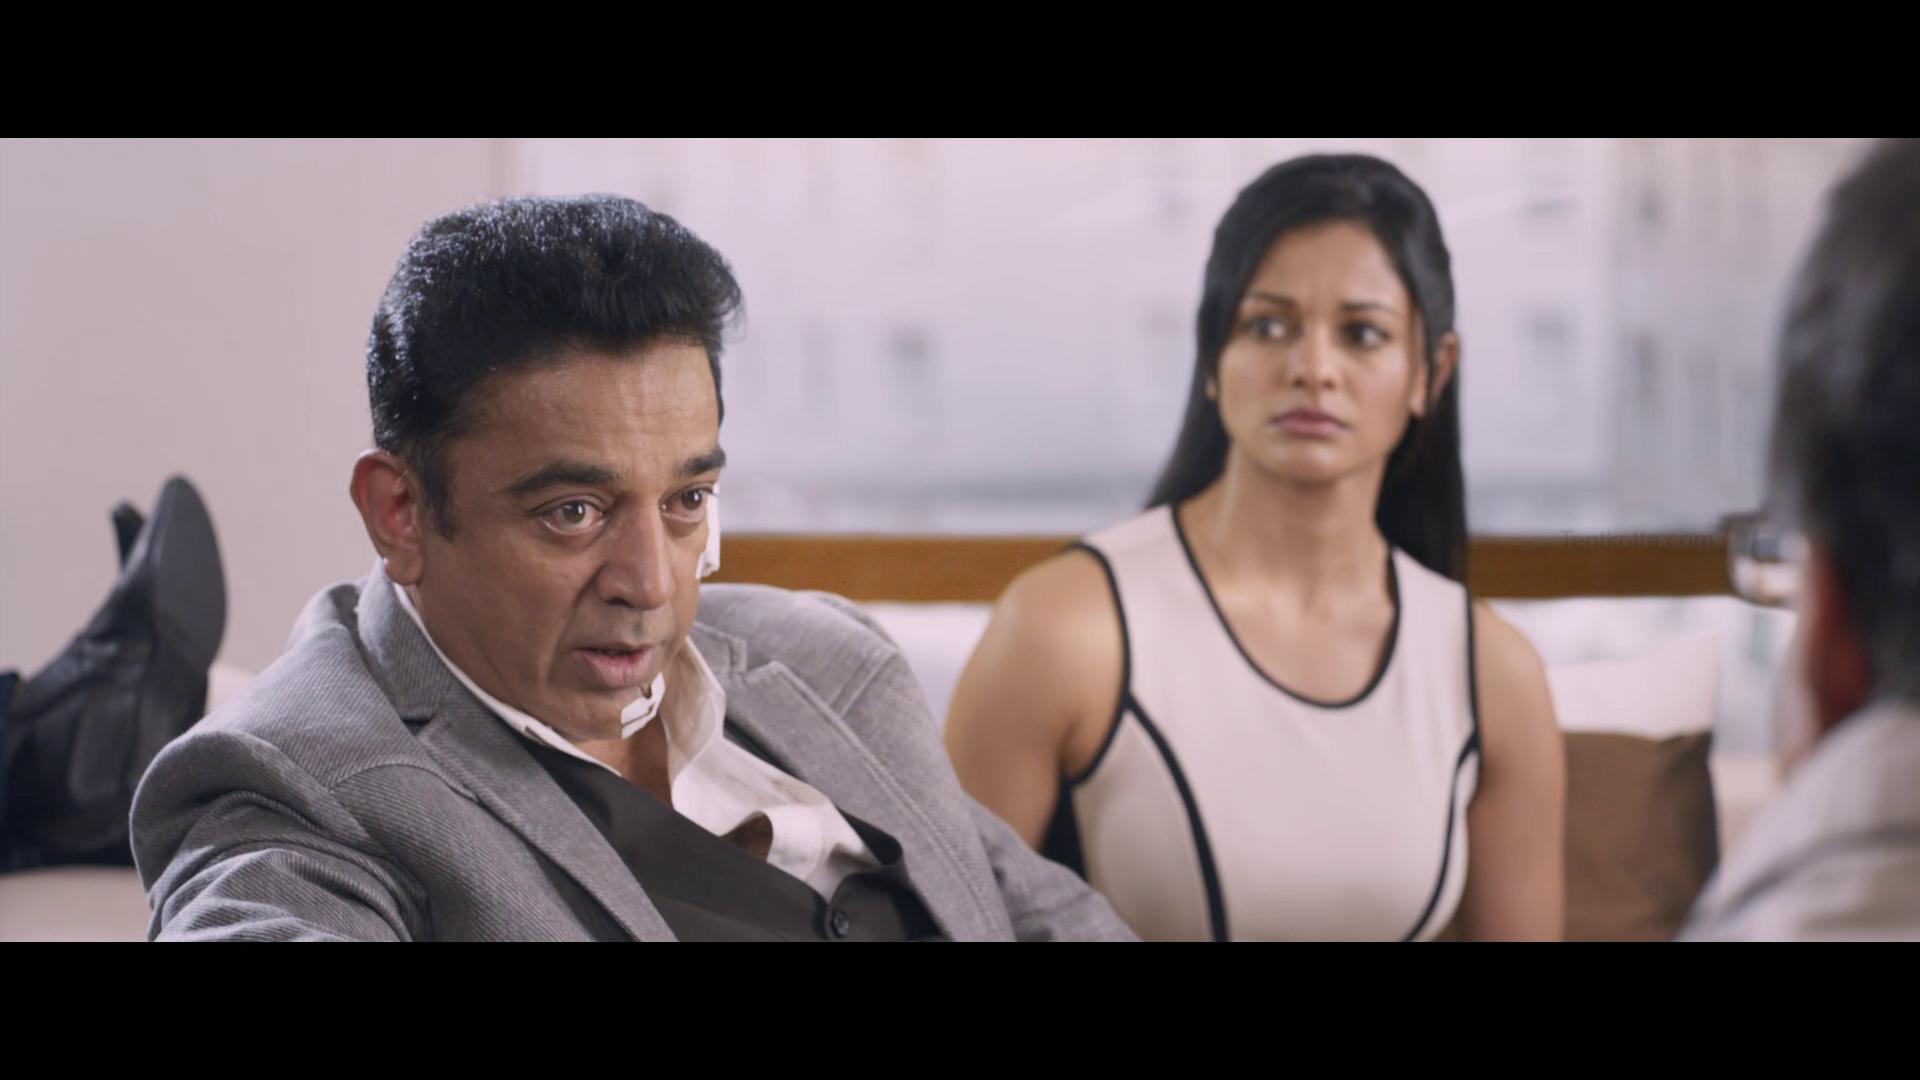 Vishwaroopam 2 (2018) Tamil - 1080p - WEB-HD - AVC - DD5.1 - ESubs TeamMTR